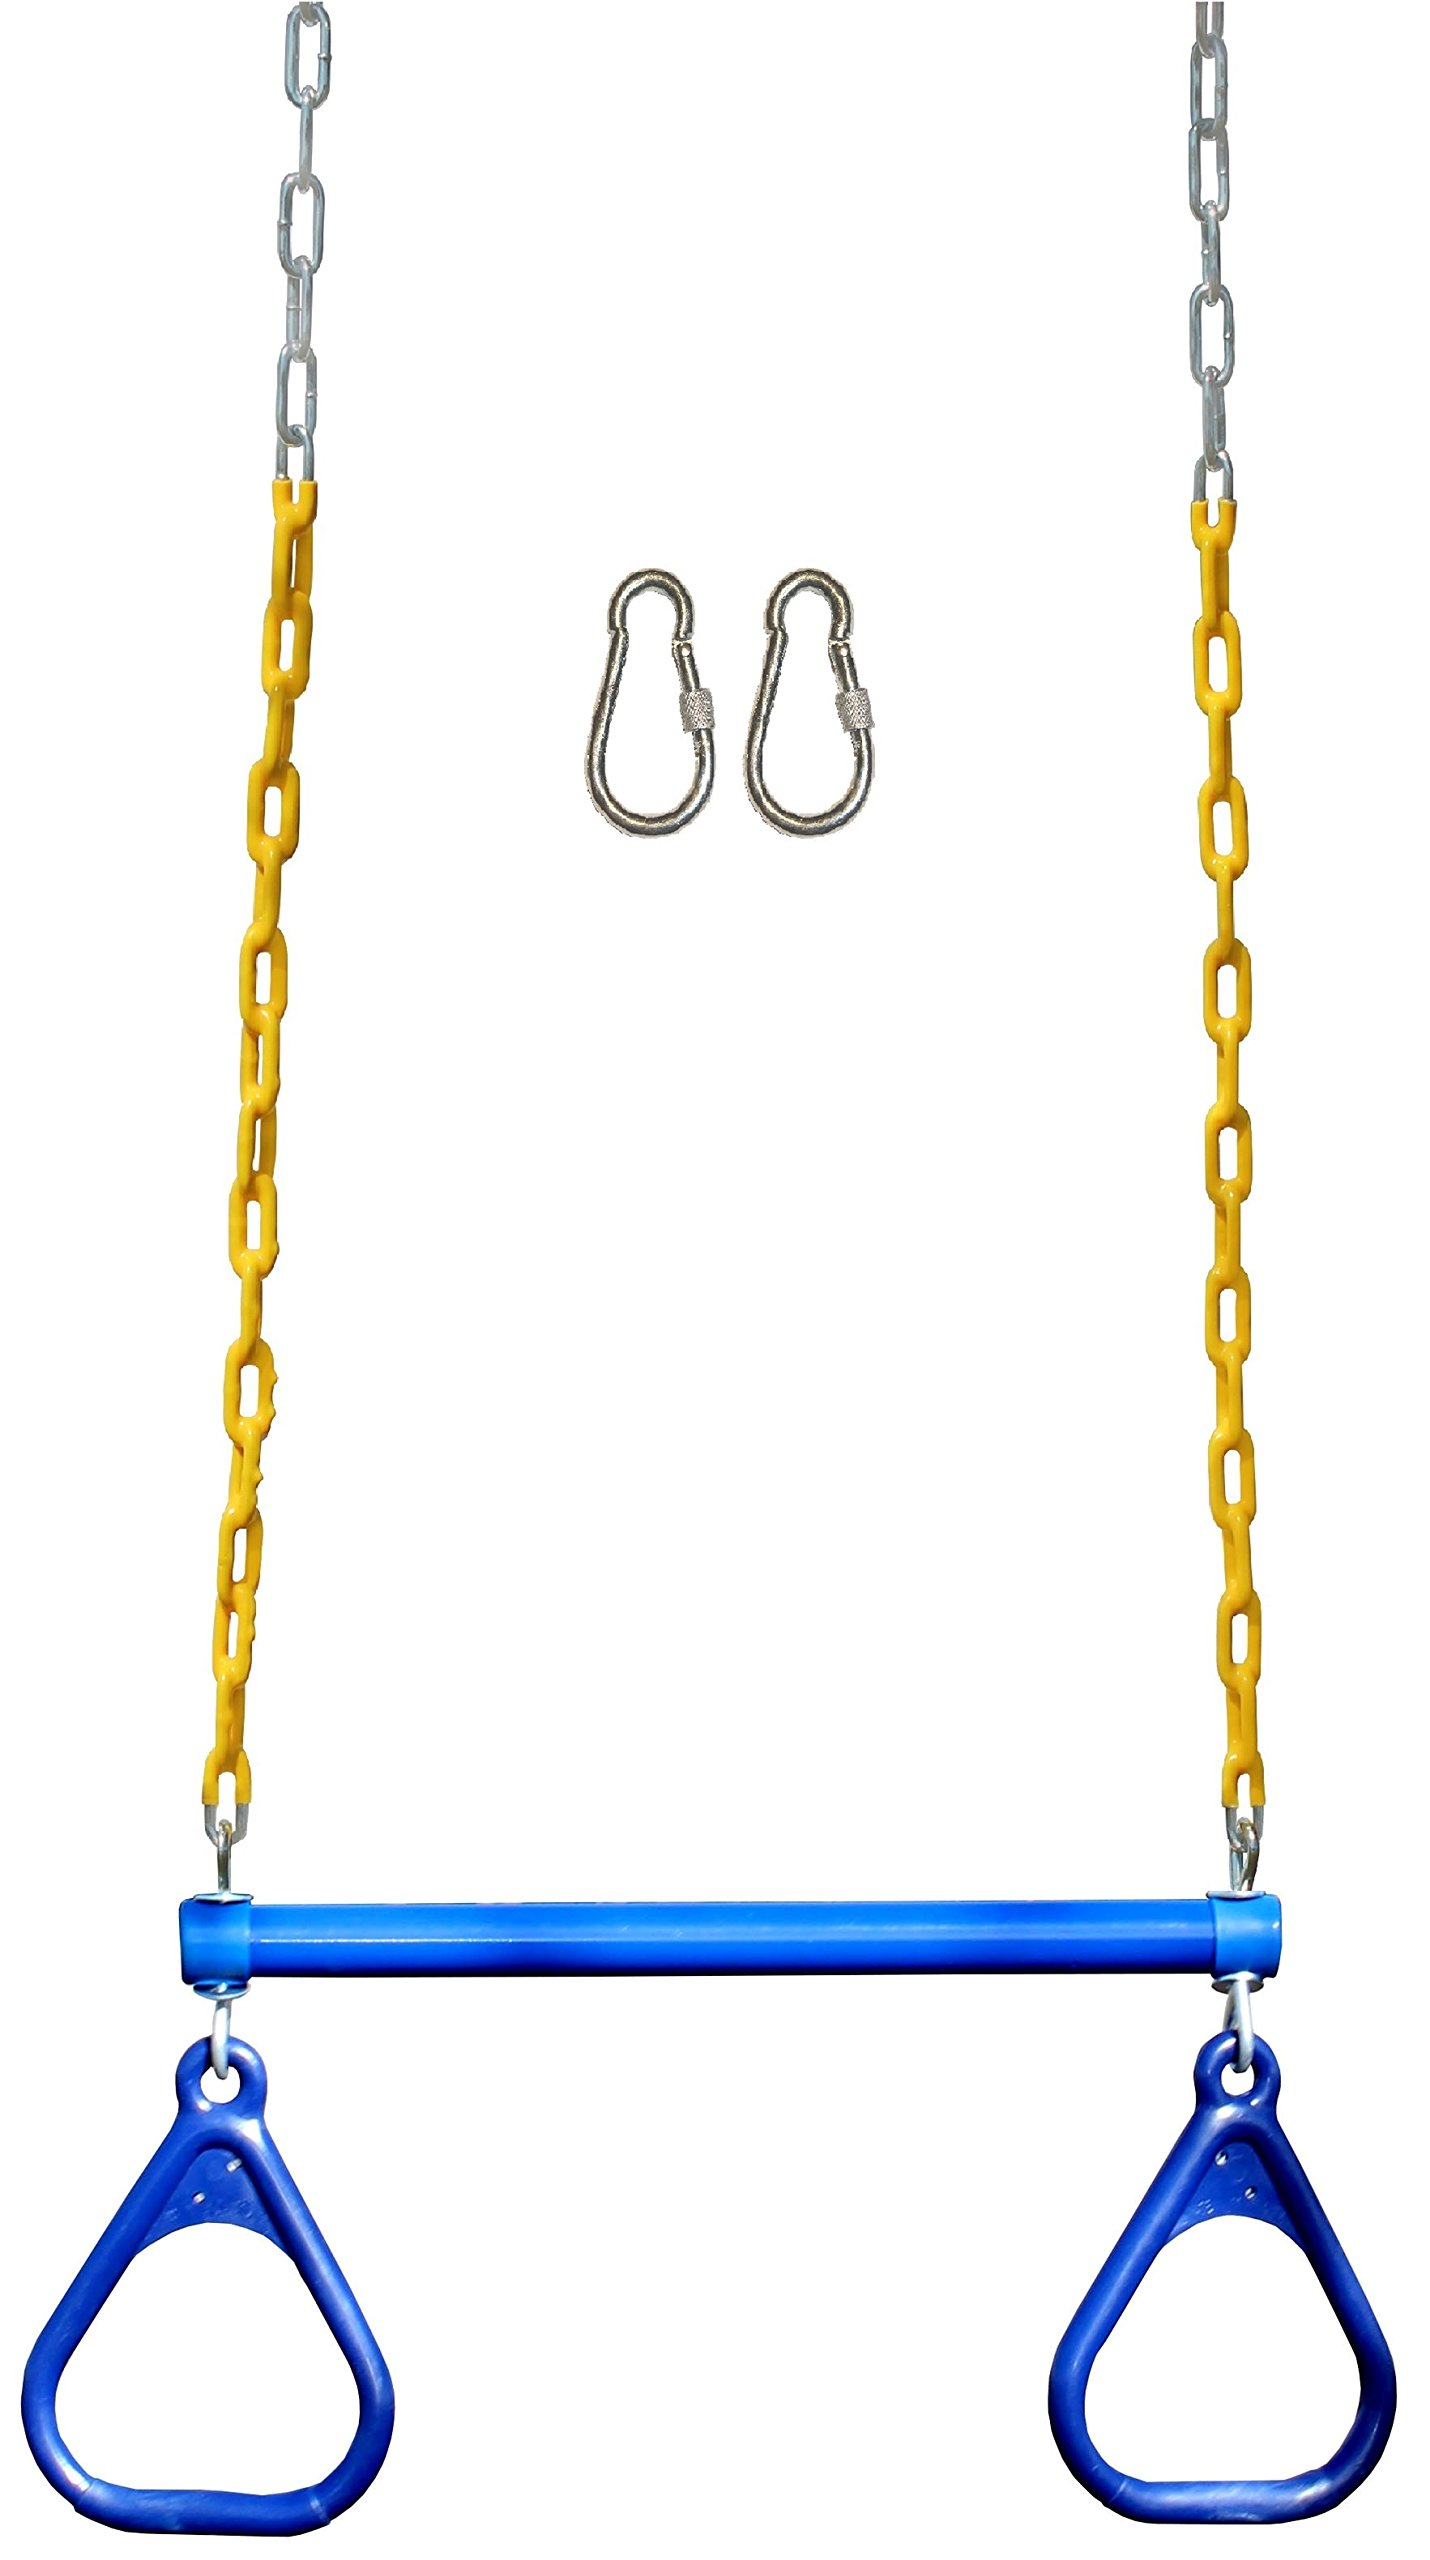 Jungle Gym Kingdom 18'' Trapeze Swing Bar Rings 48'' Heavy Duty Chain Swing Set Accessories & Locking Carabiners (Blue) by Jungle Gym Kingdom